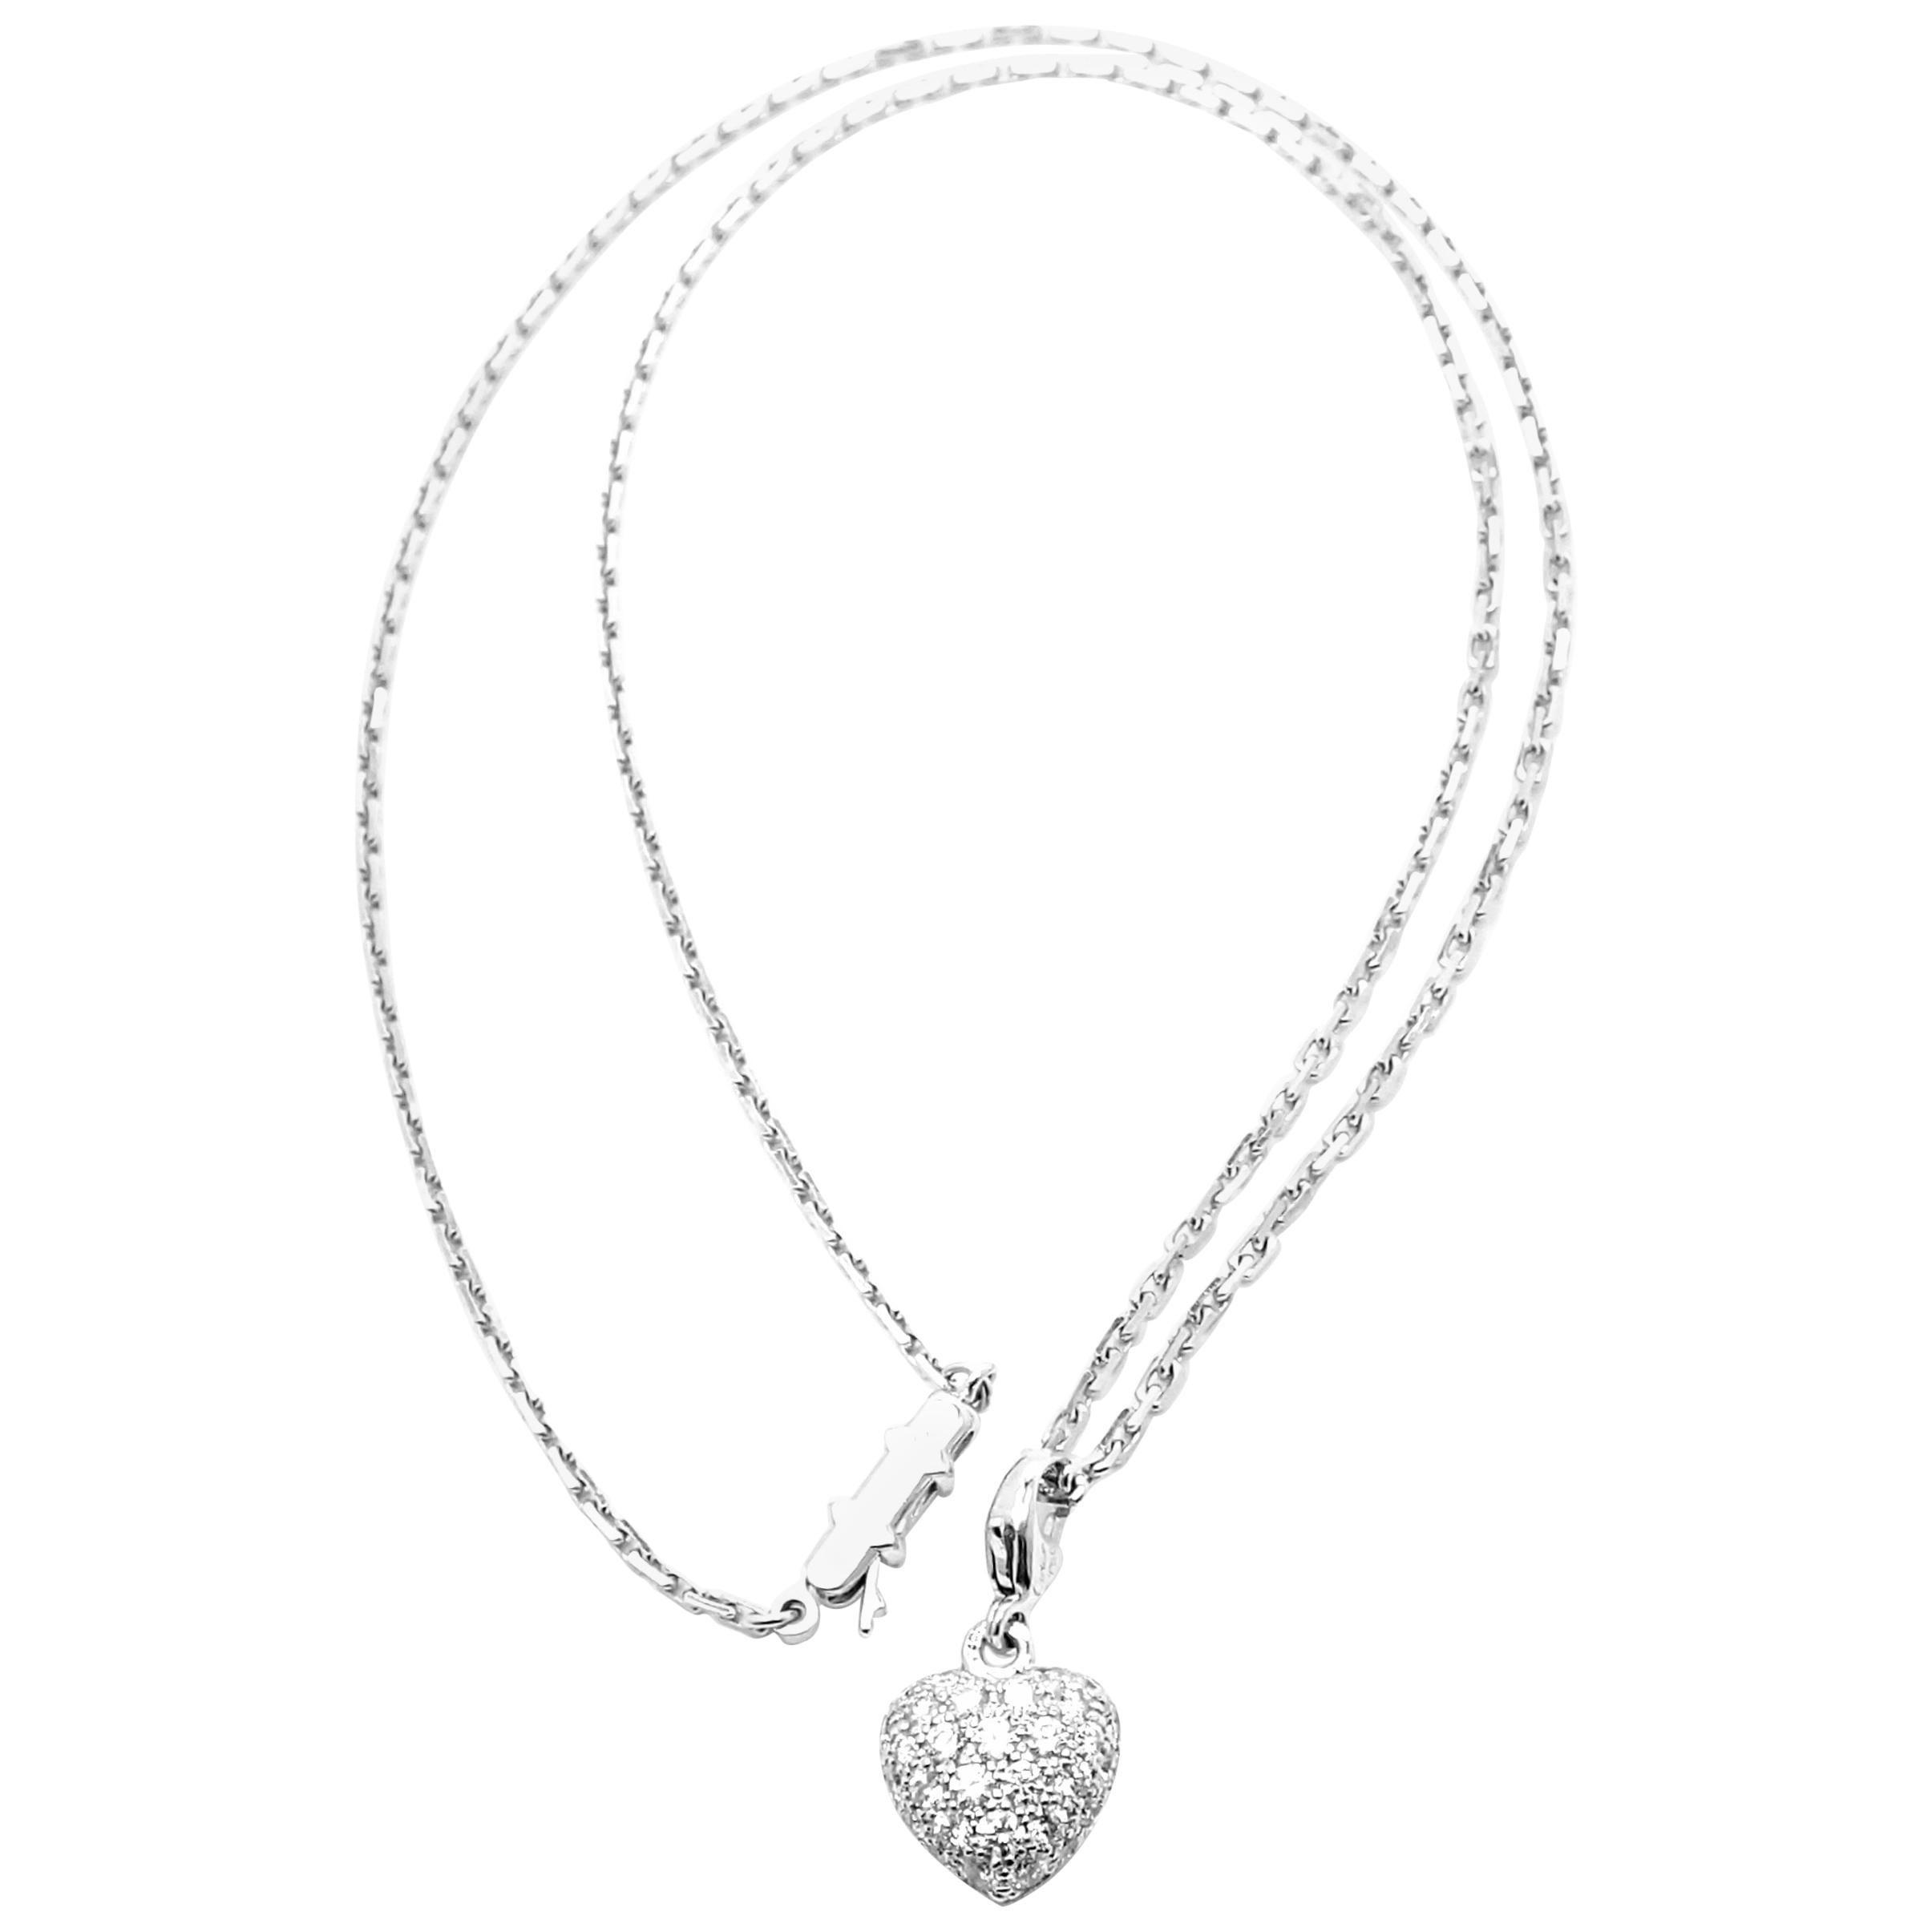 Cartier Diamond Pave Heart White Gold Pendant Necklace